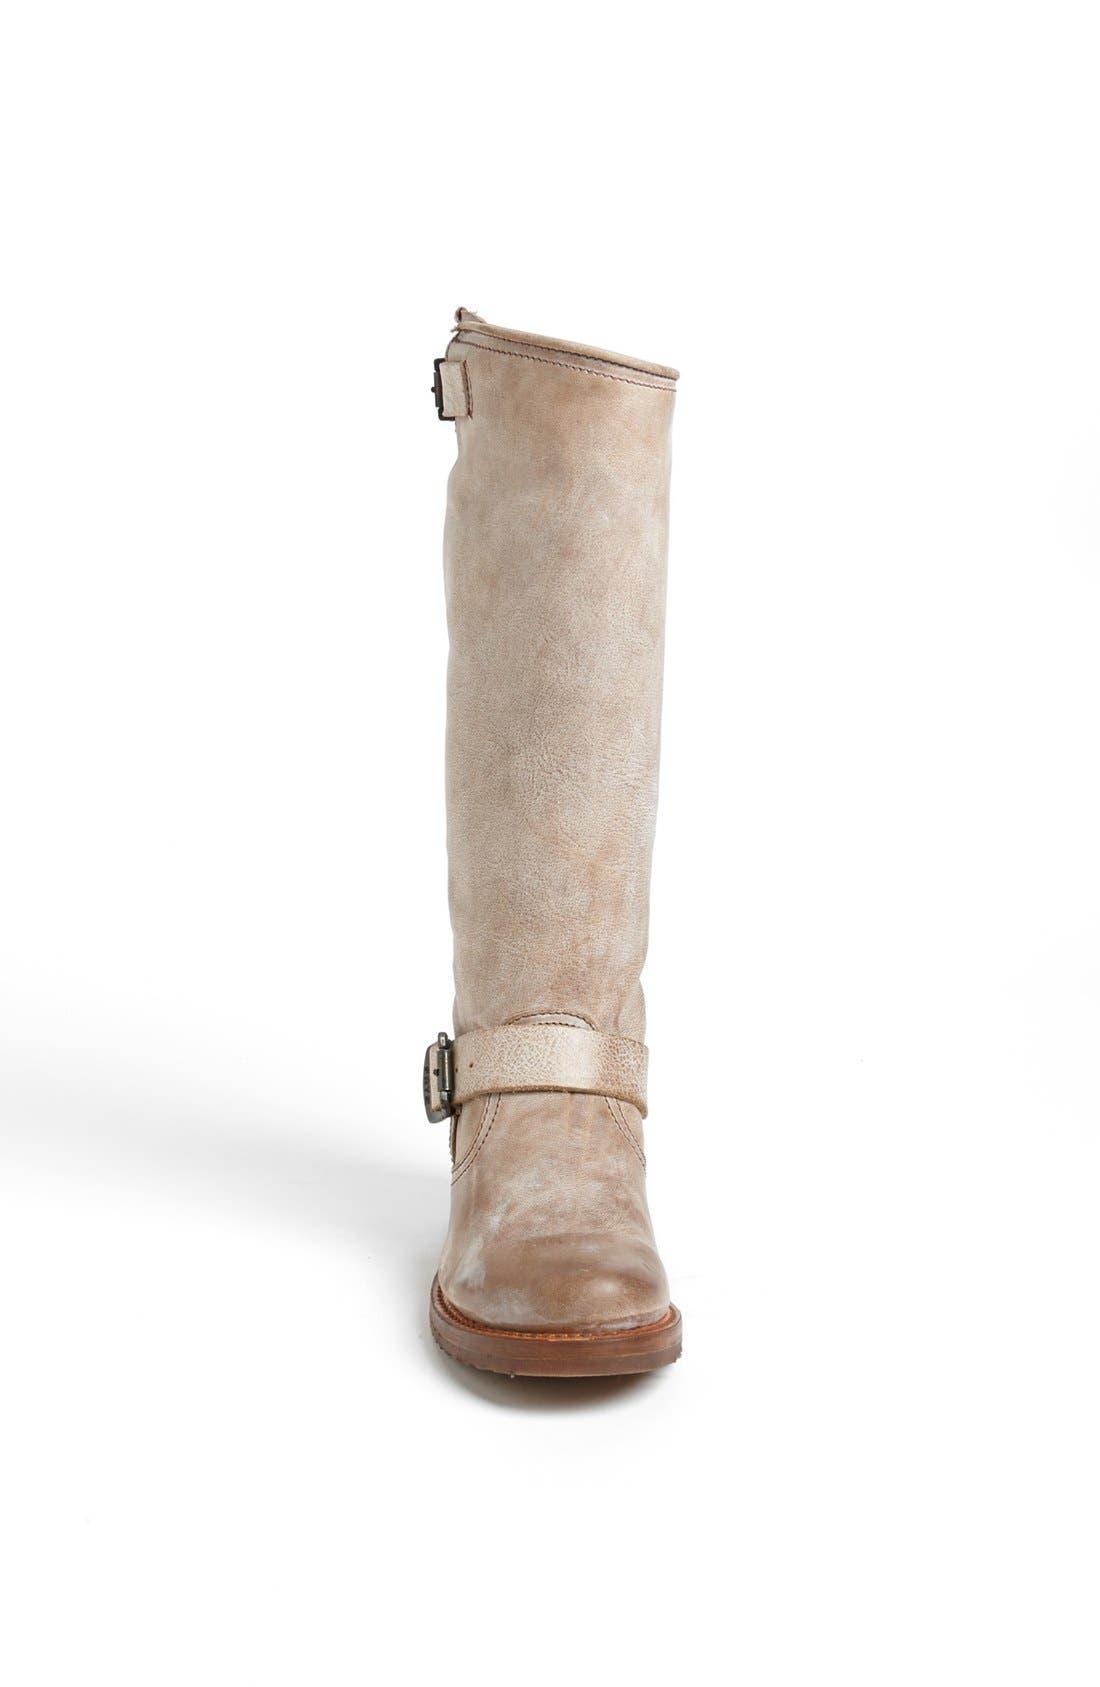 Alternate Image 3  - Frye 'Veronica Slouch' Boot (Regular & Wide Calf) (Women)